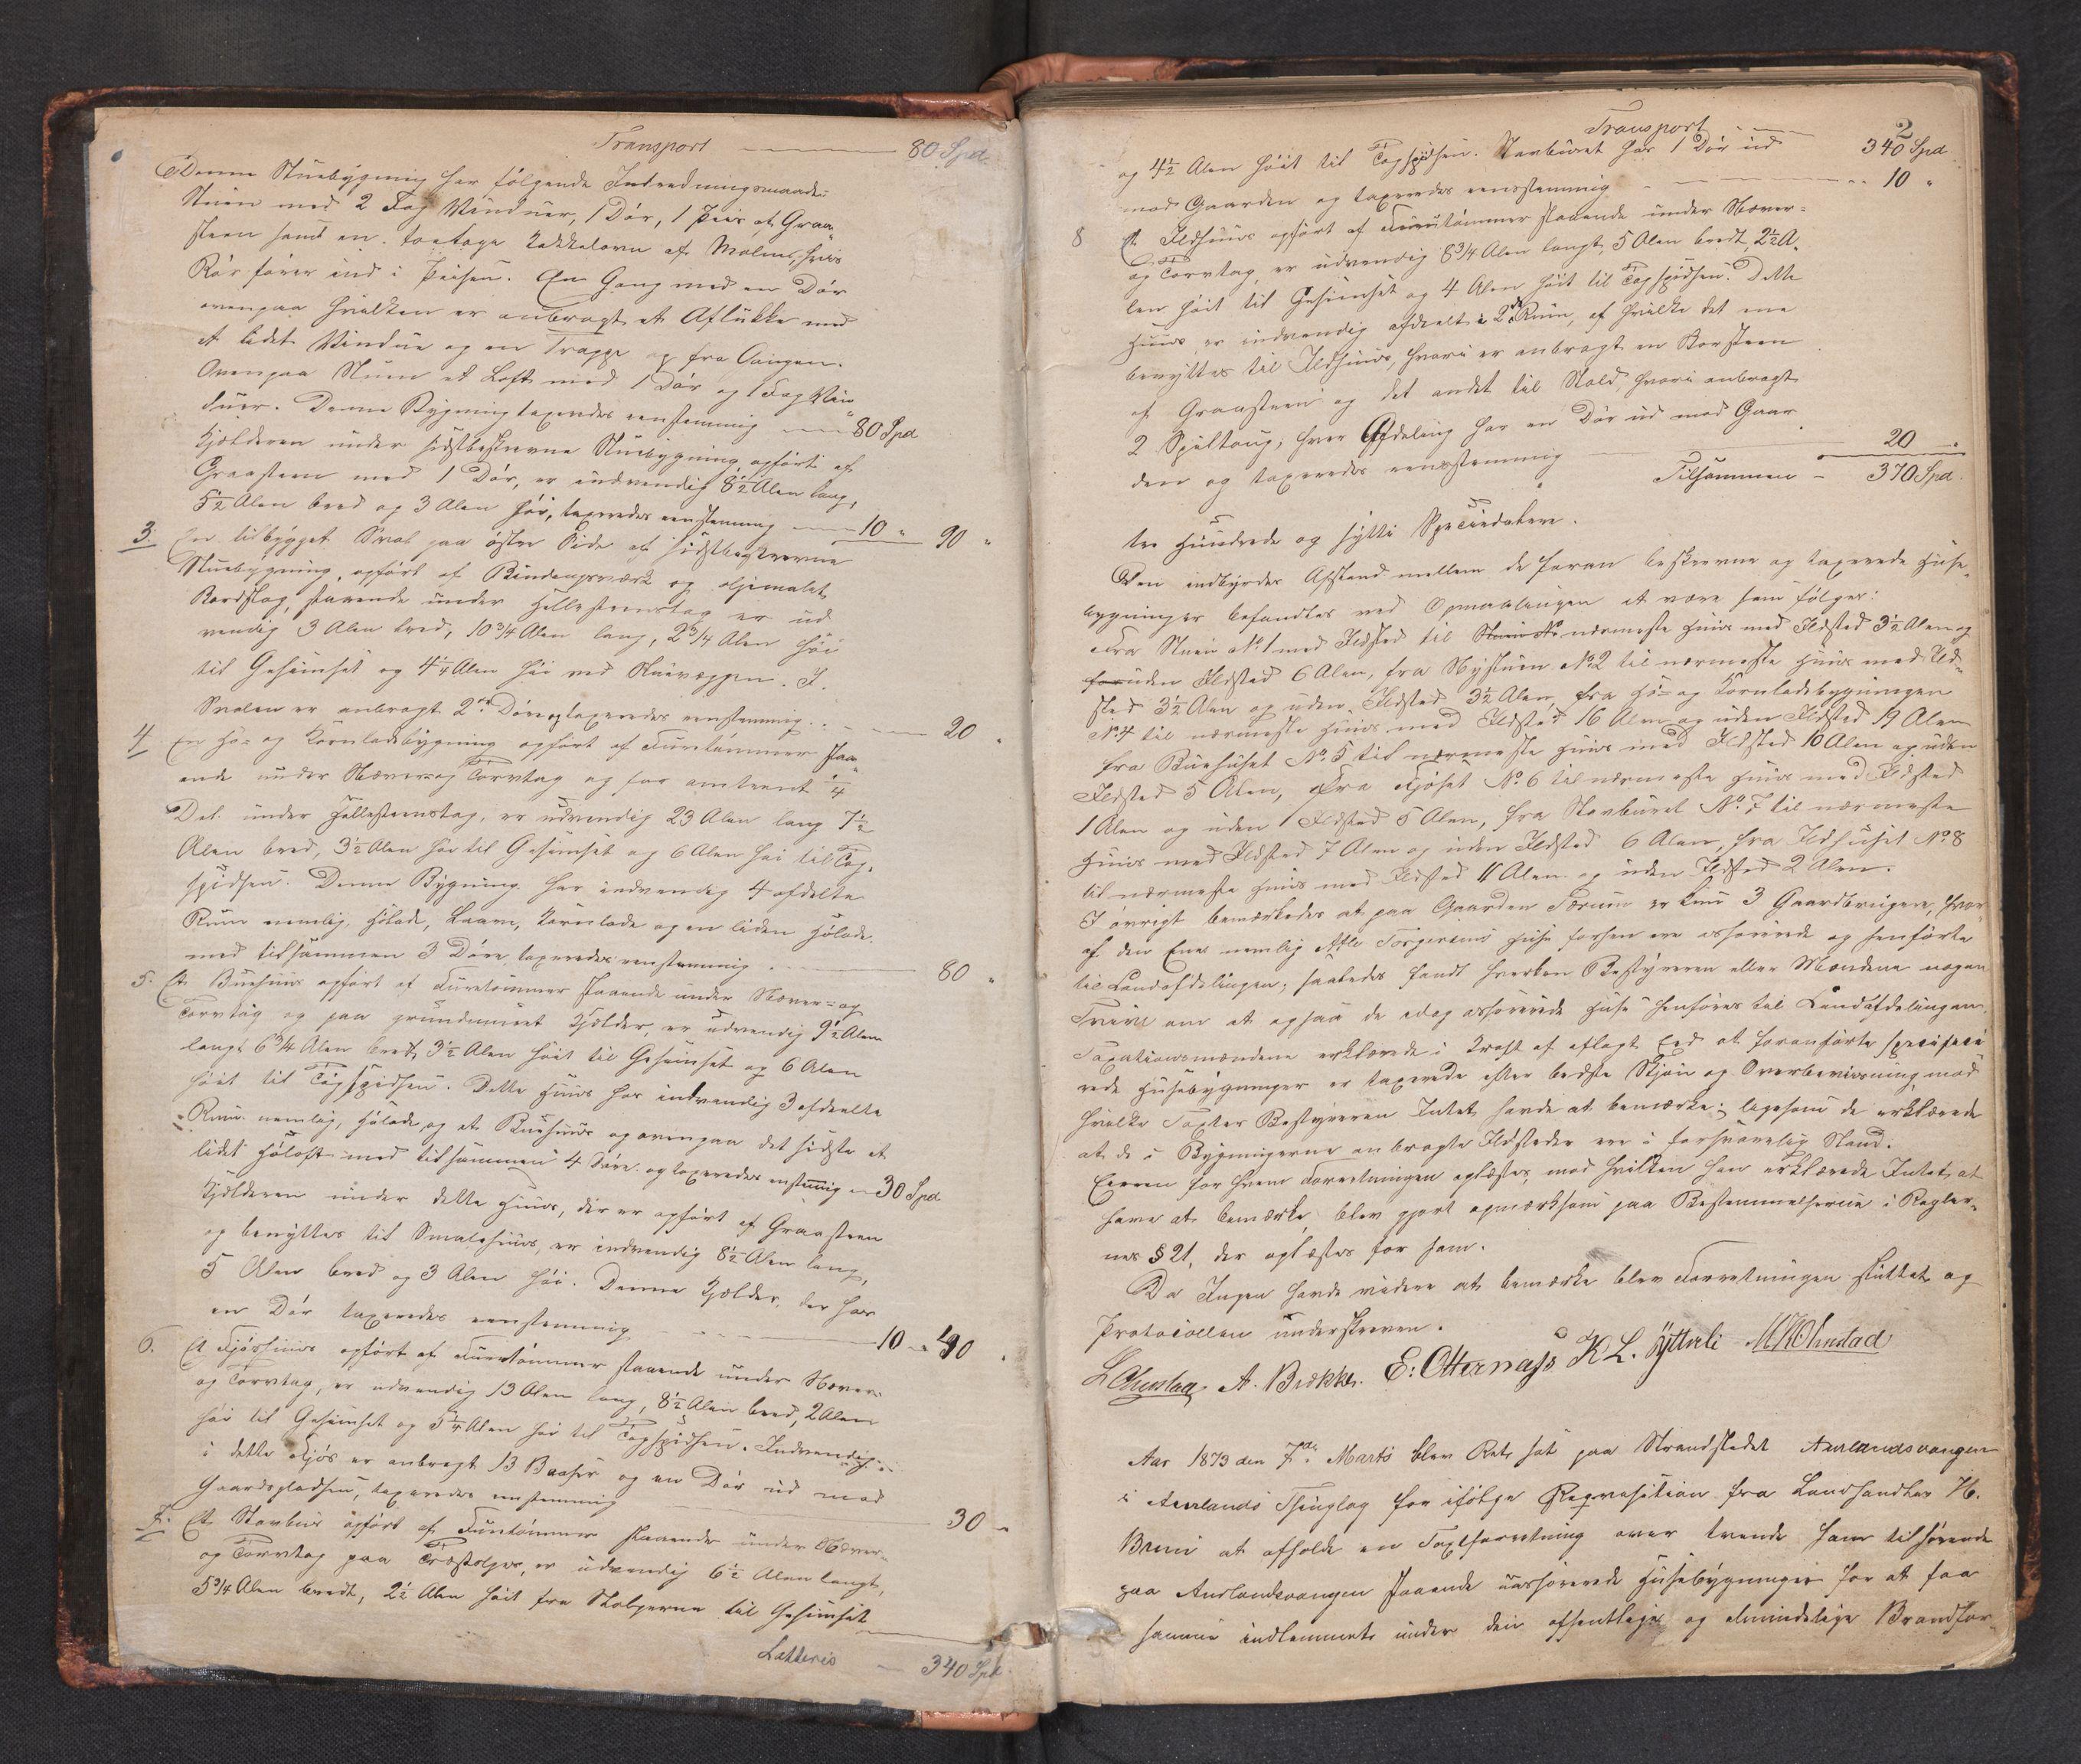 SAB, Lensmannen i Aurland, 0012/L0002: Branntakstprotokoll, 1873-1917, p. 1b-2a